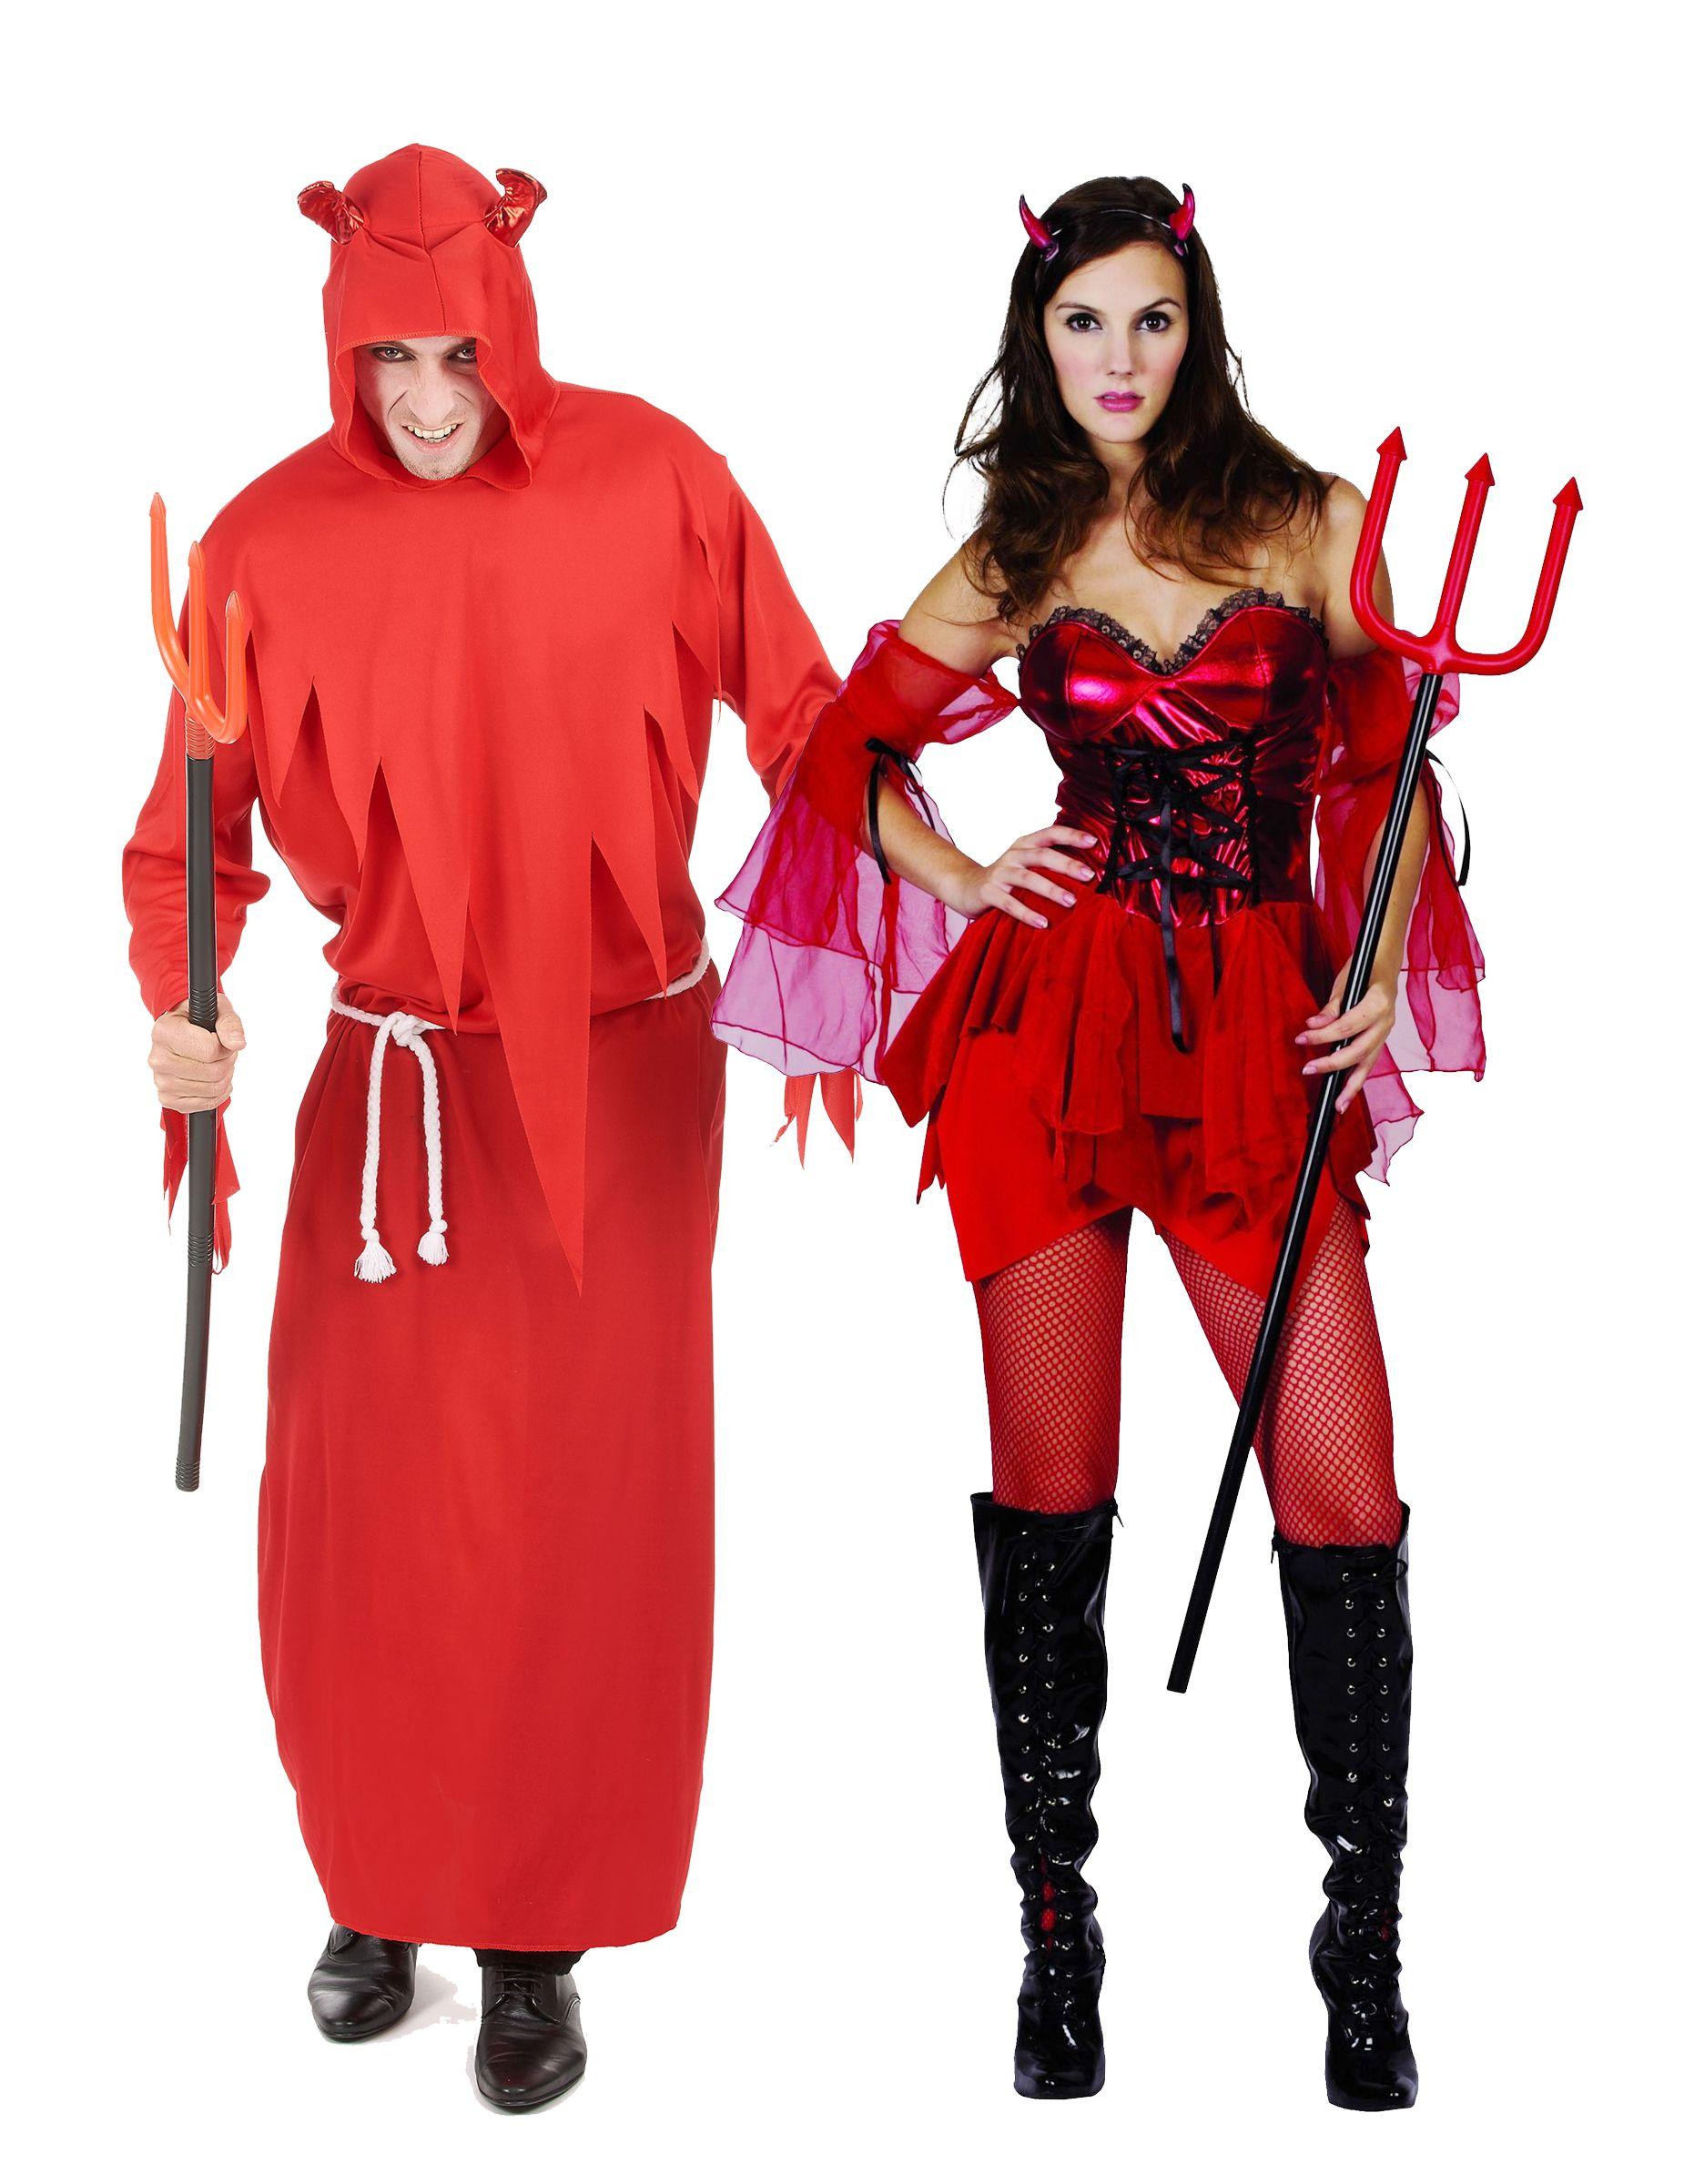 Vestiti Halloween.Costume Coppia Di Diavoli Per Halloween Nel 2019 Halloween